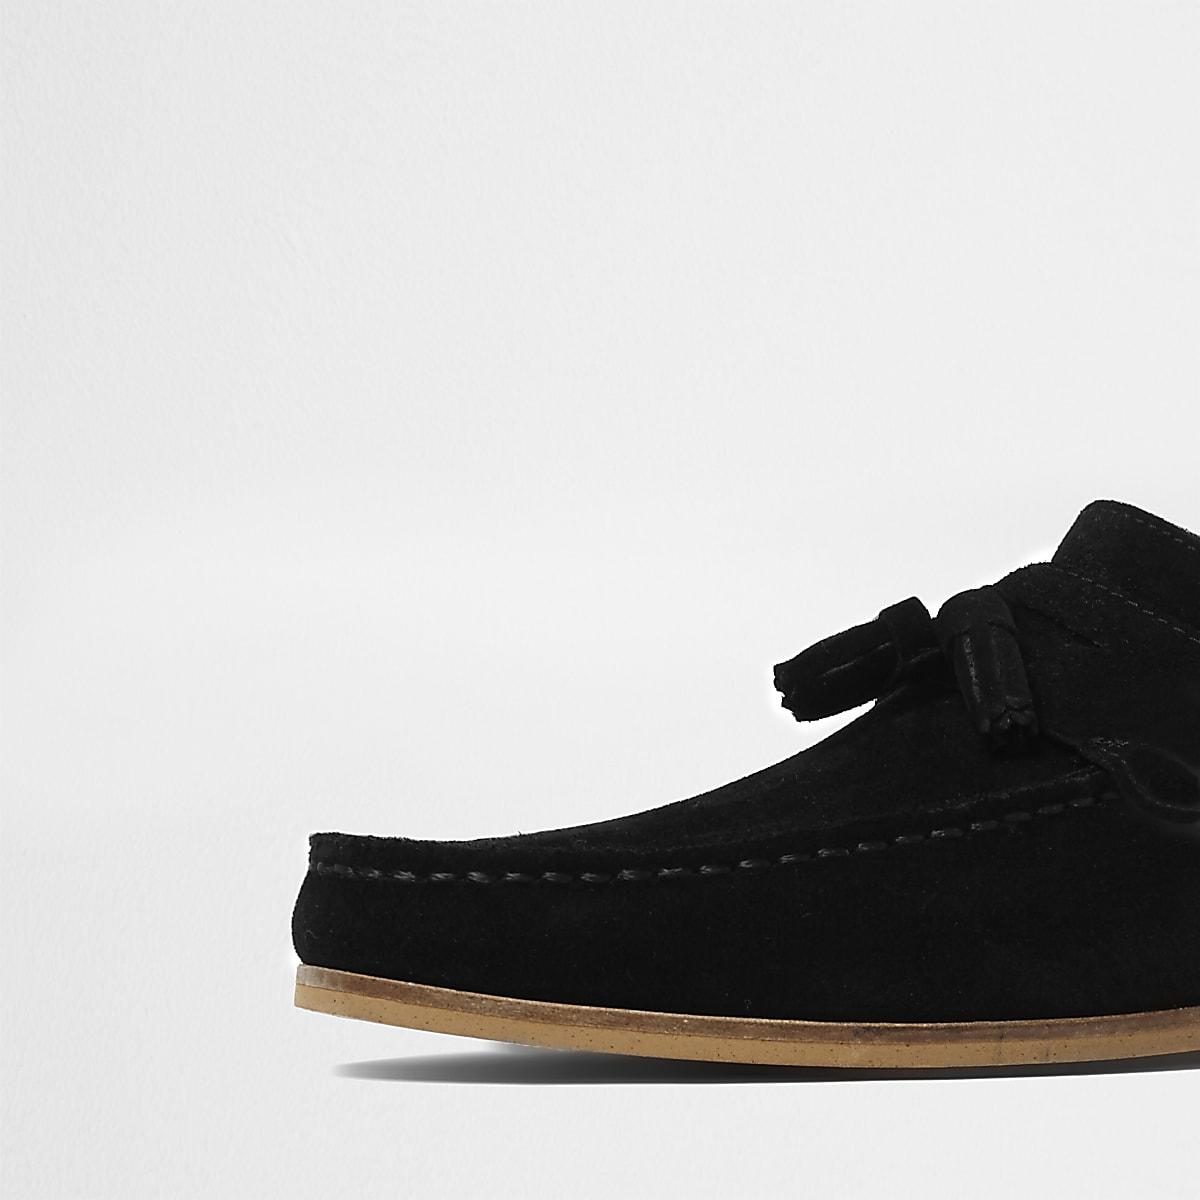 c9fa7c24438 Black wide fit suede tassel loafers - Shoes - Shoes   Boots - men